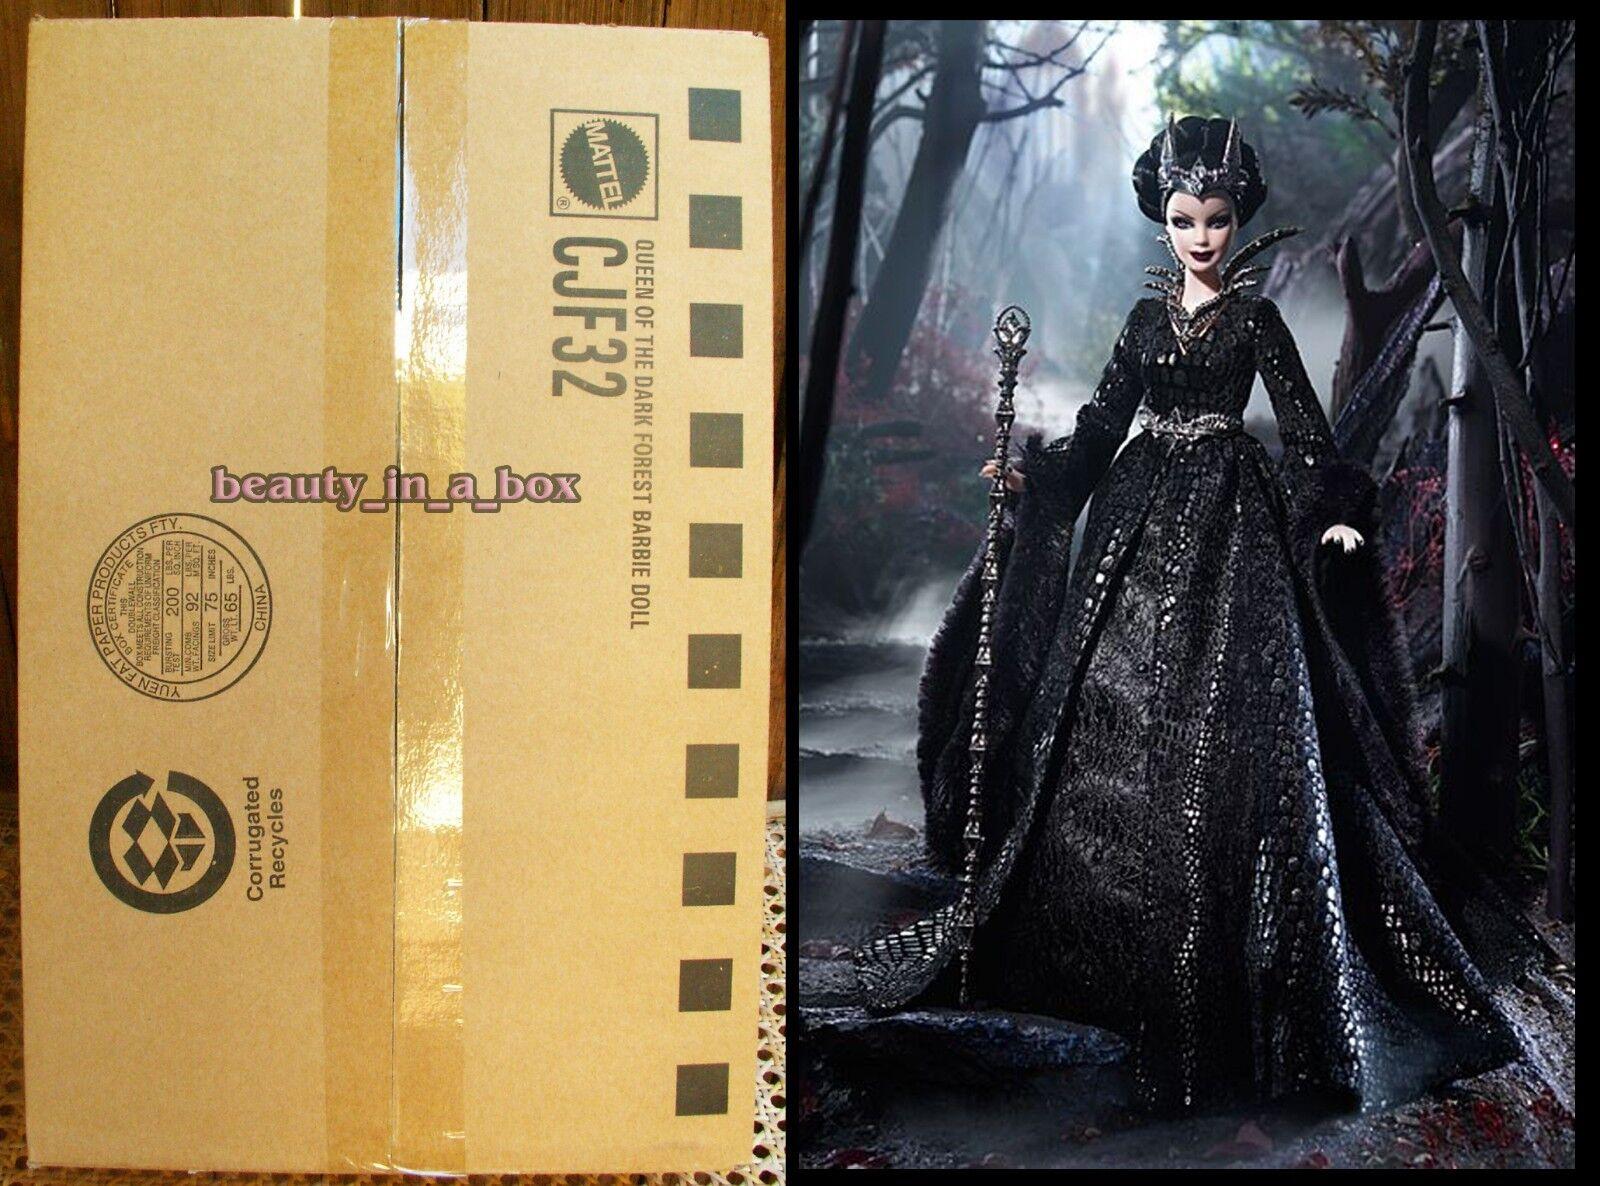 Reina del bosque oscuro Muñeca Barbie embrujada belleza embarcador oro Label